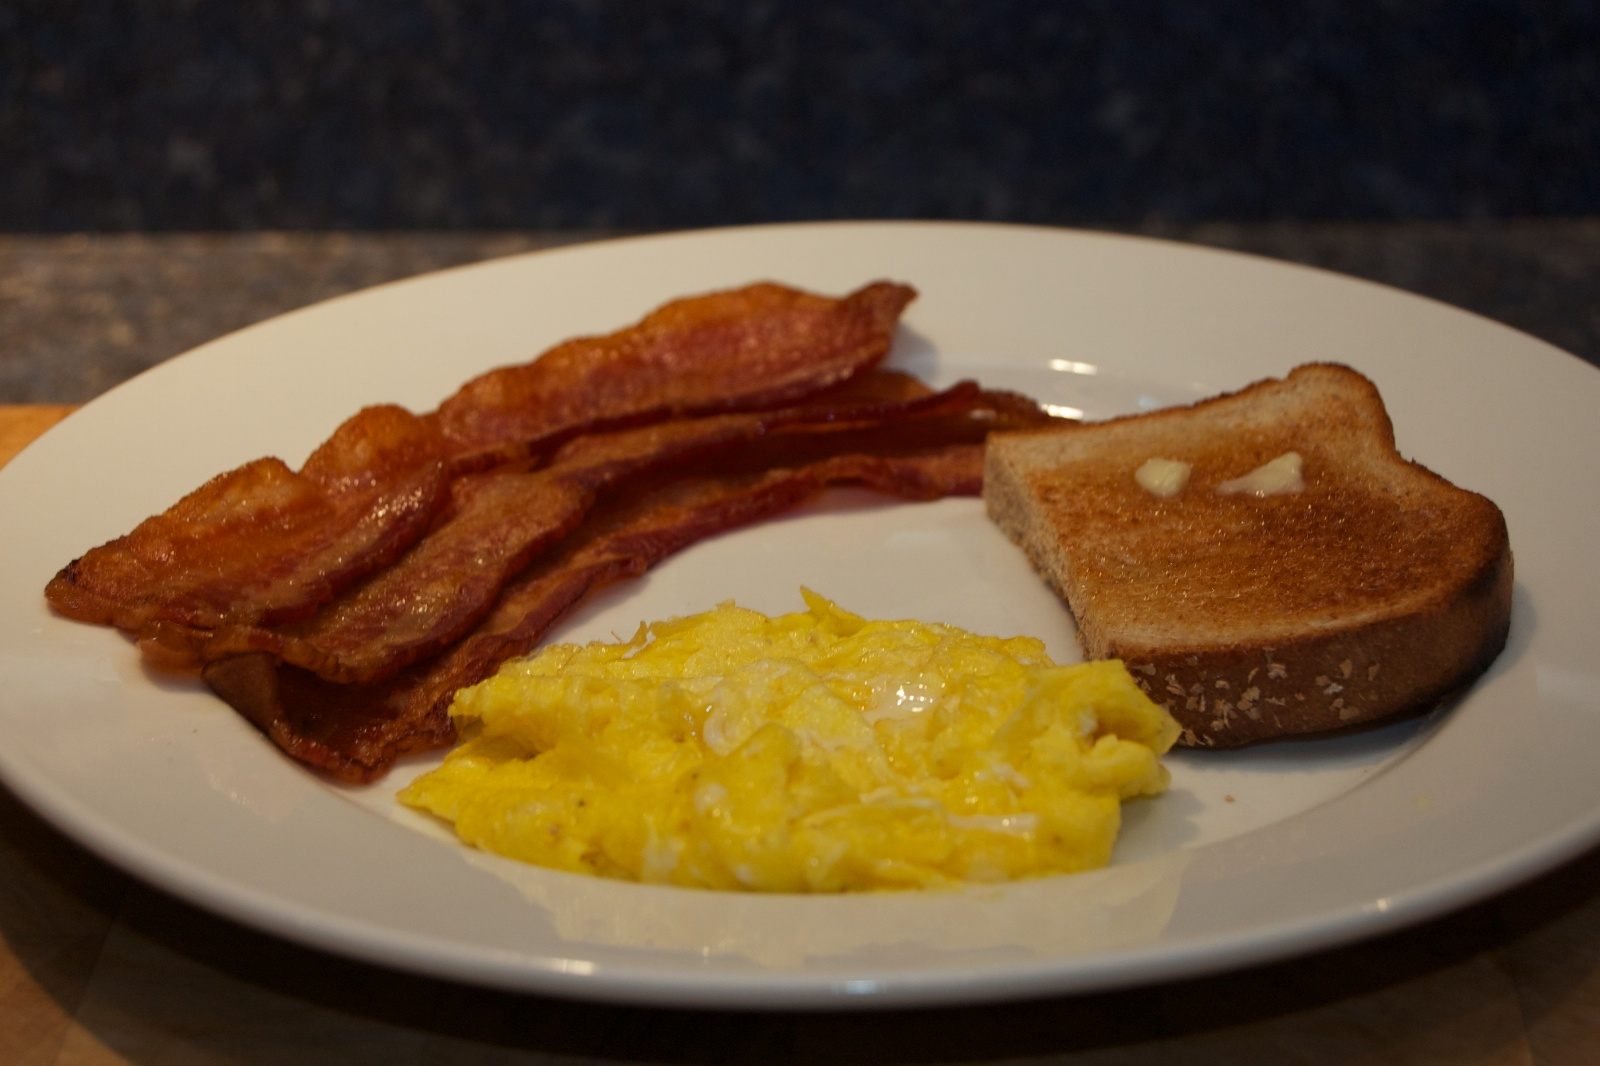 http://blog.rickk.com/food/2014/03/18/ate.2014.03.18.b.jpg